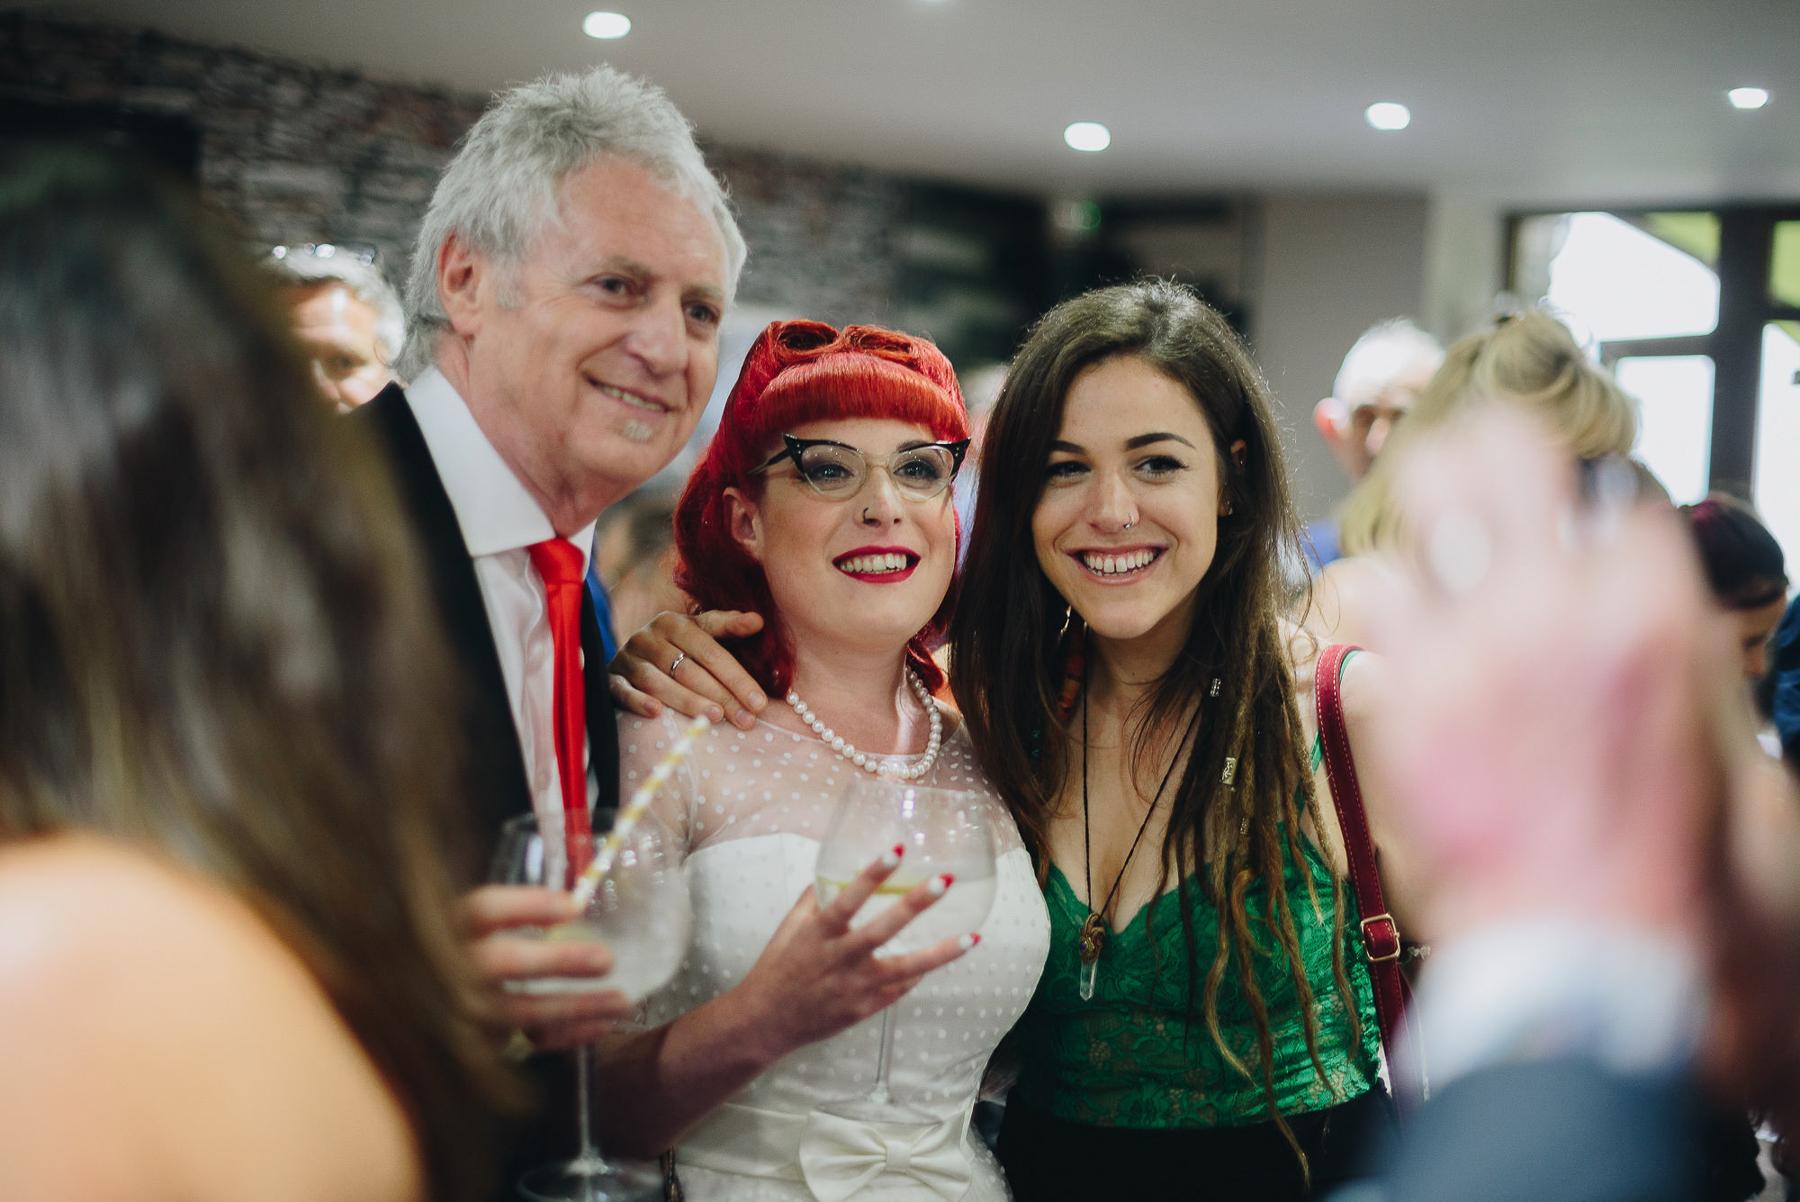 Wellbeing_Farm_Wedding_Photography_The_Pin-Up_Bride_Lara_Shaun-110.jpg